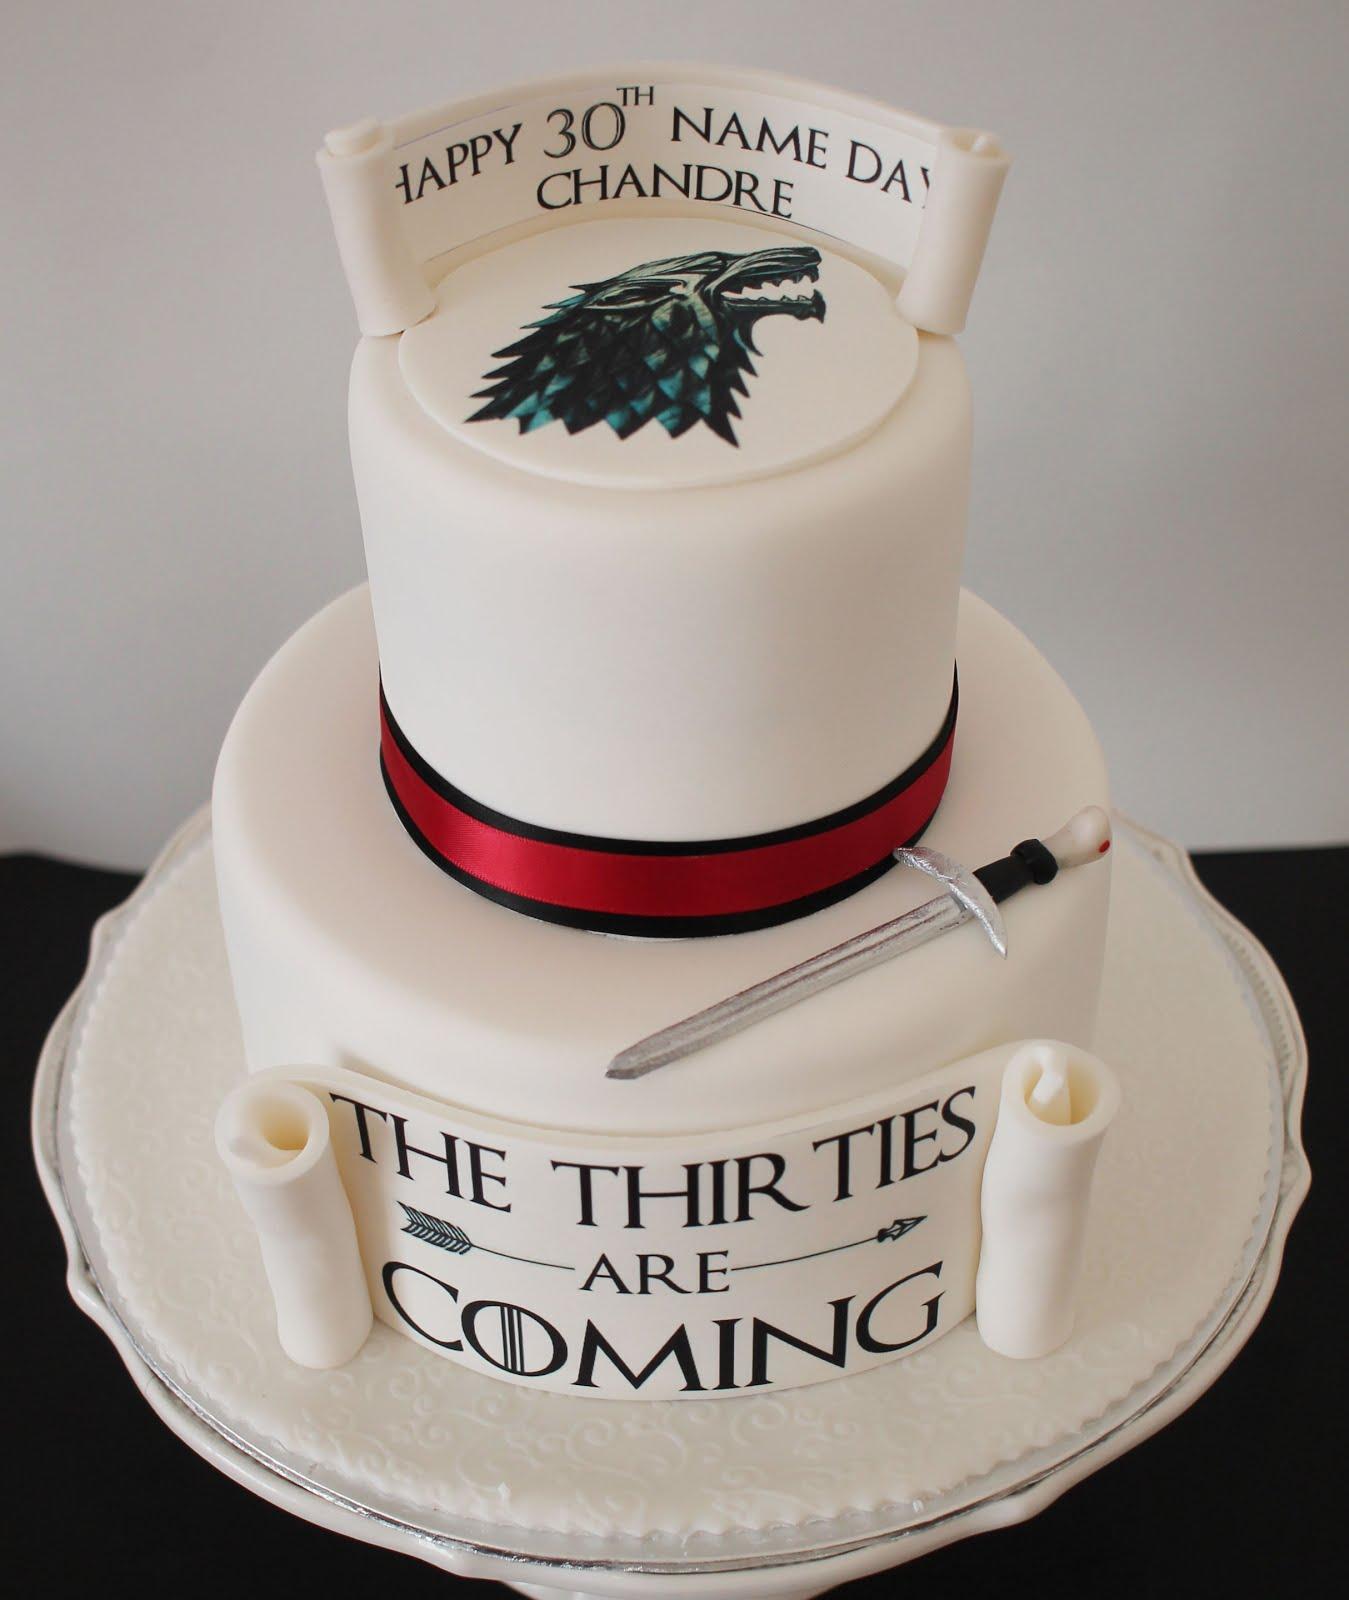 Stupendous Delanas Cakes Game Of Thrones Cake Personalised Birthday Cards Cominlily Jamesorg